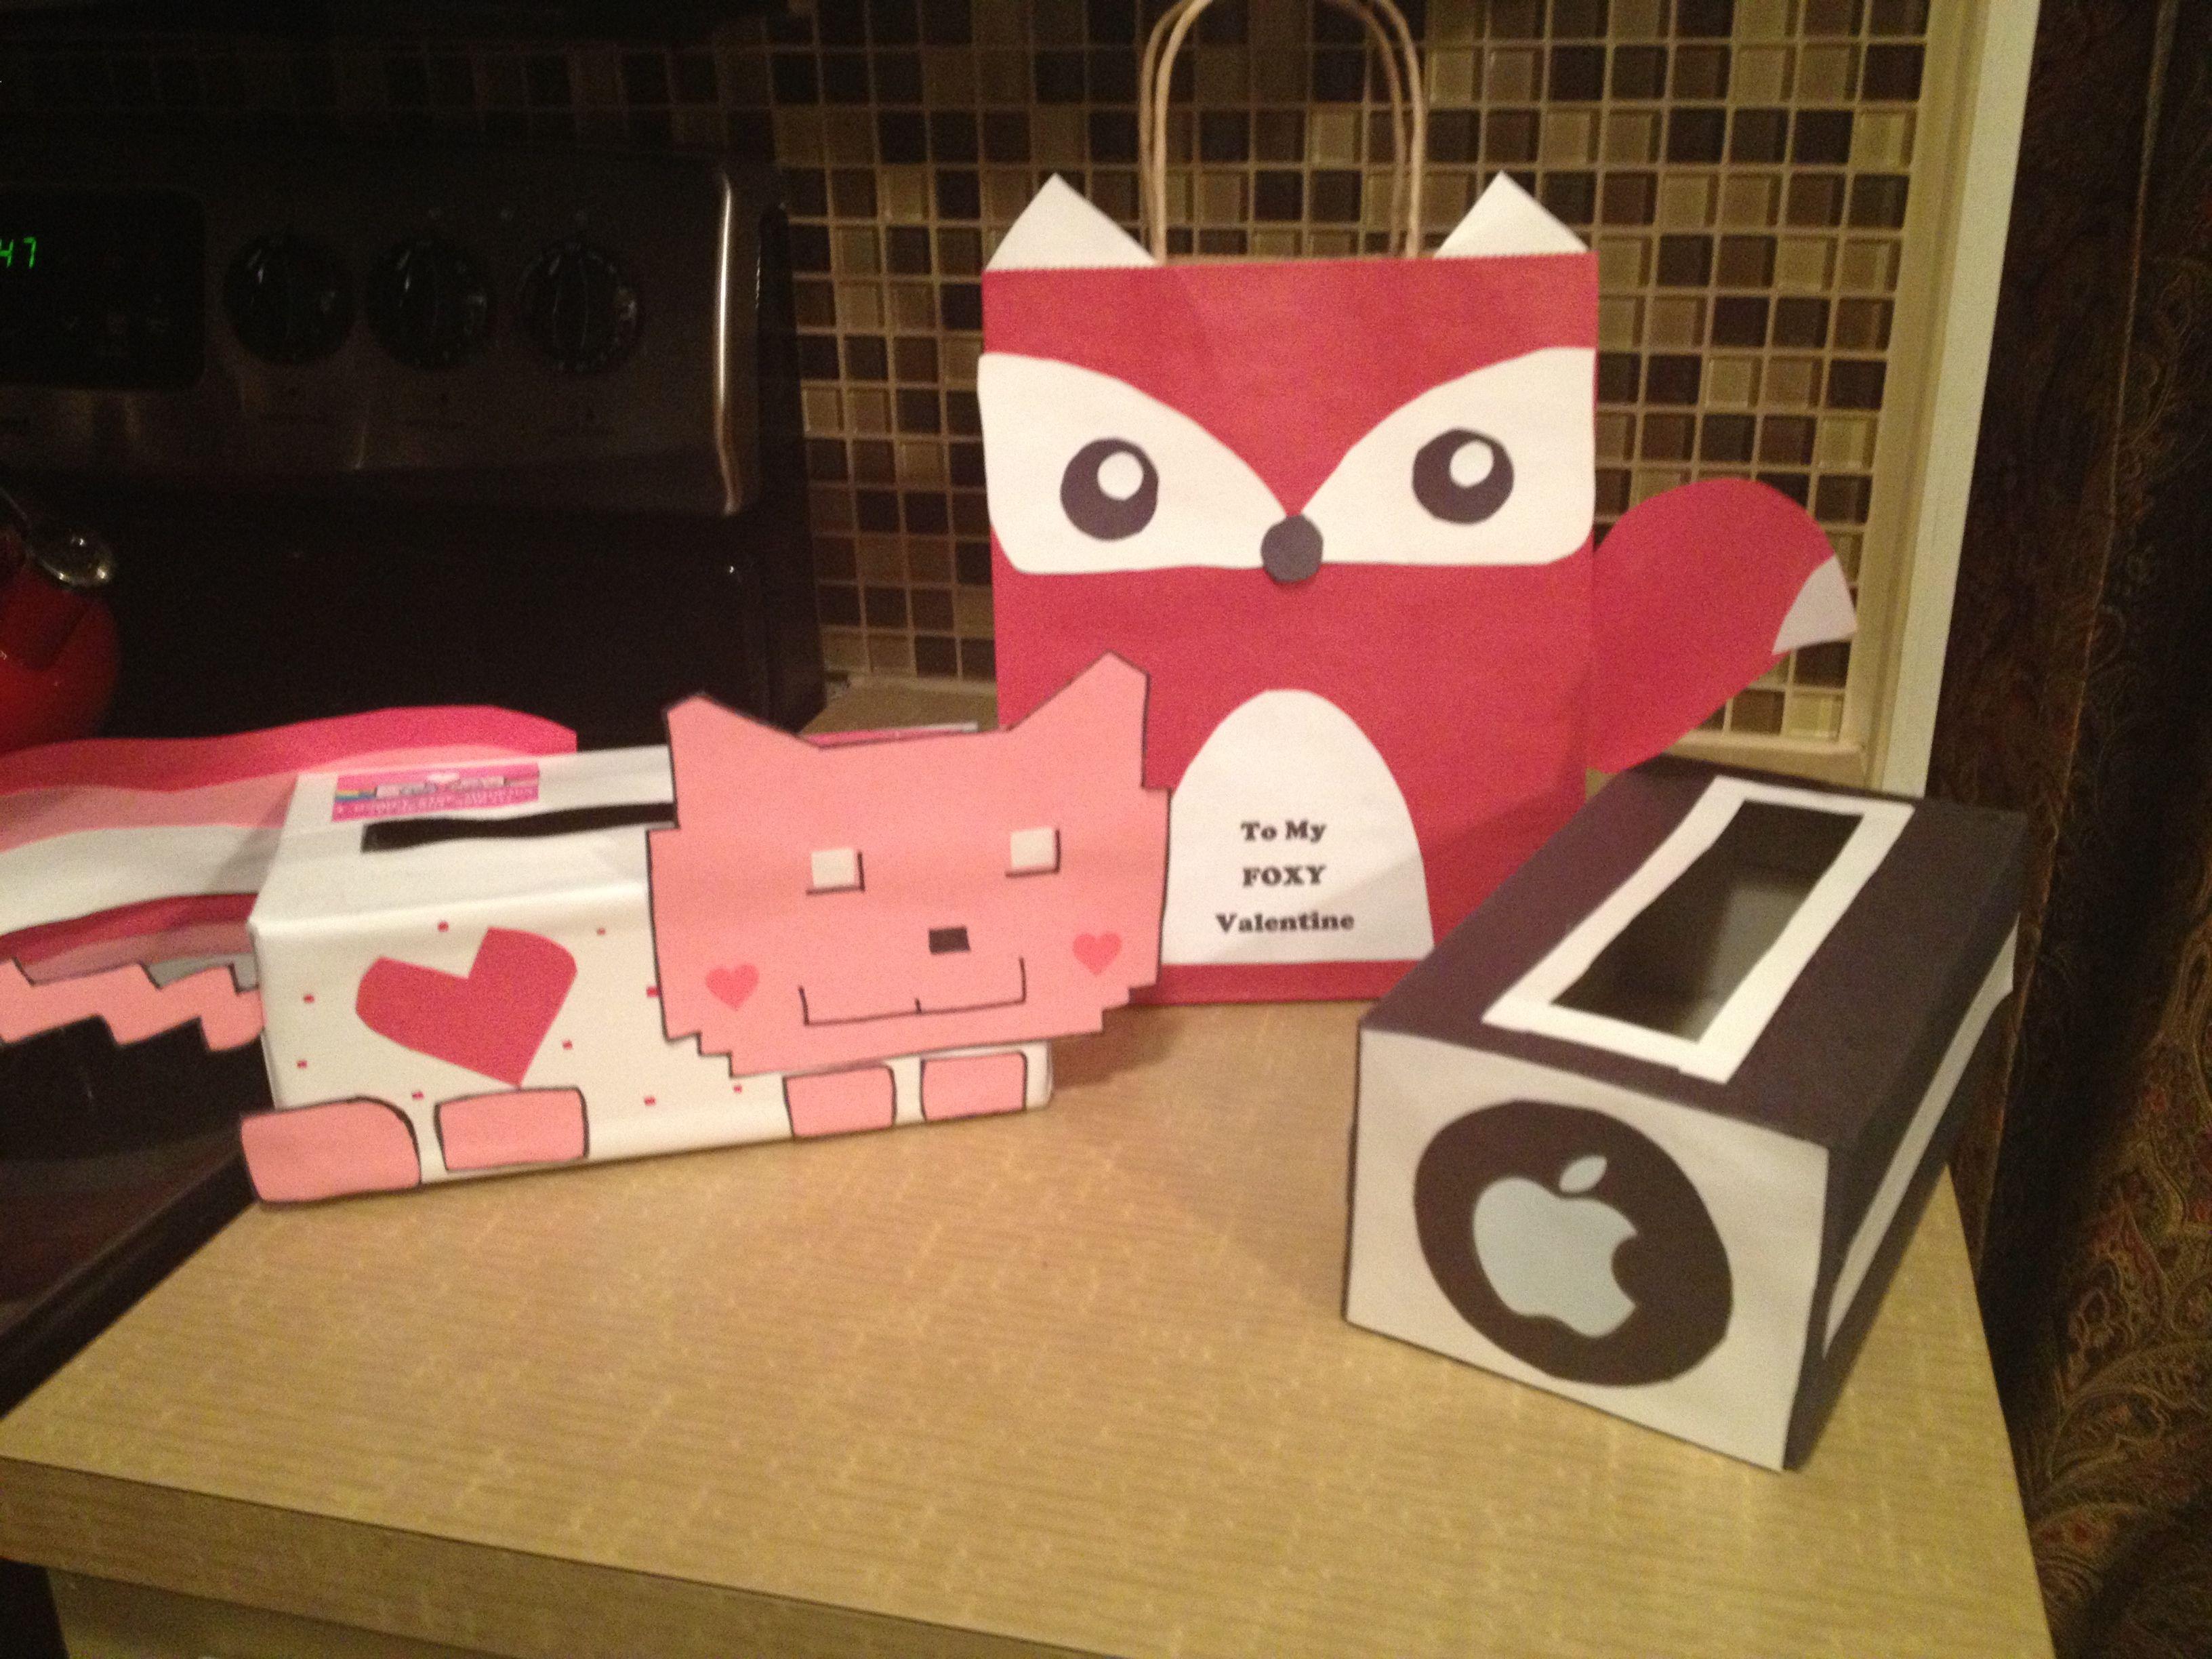 valentines day boxes nyan cat fox and ibox - Cat Valentine Box